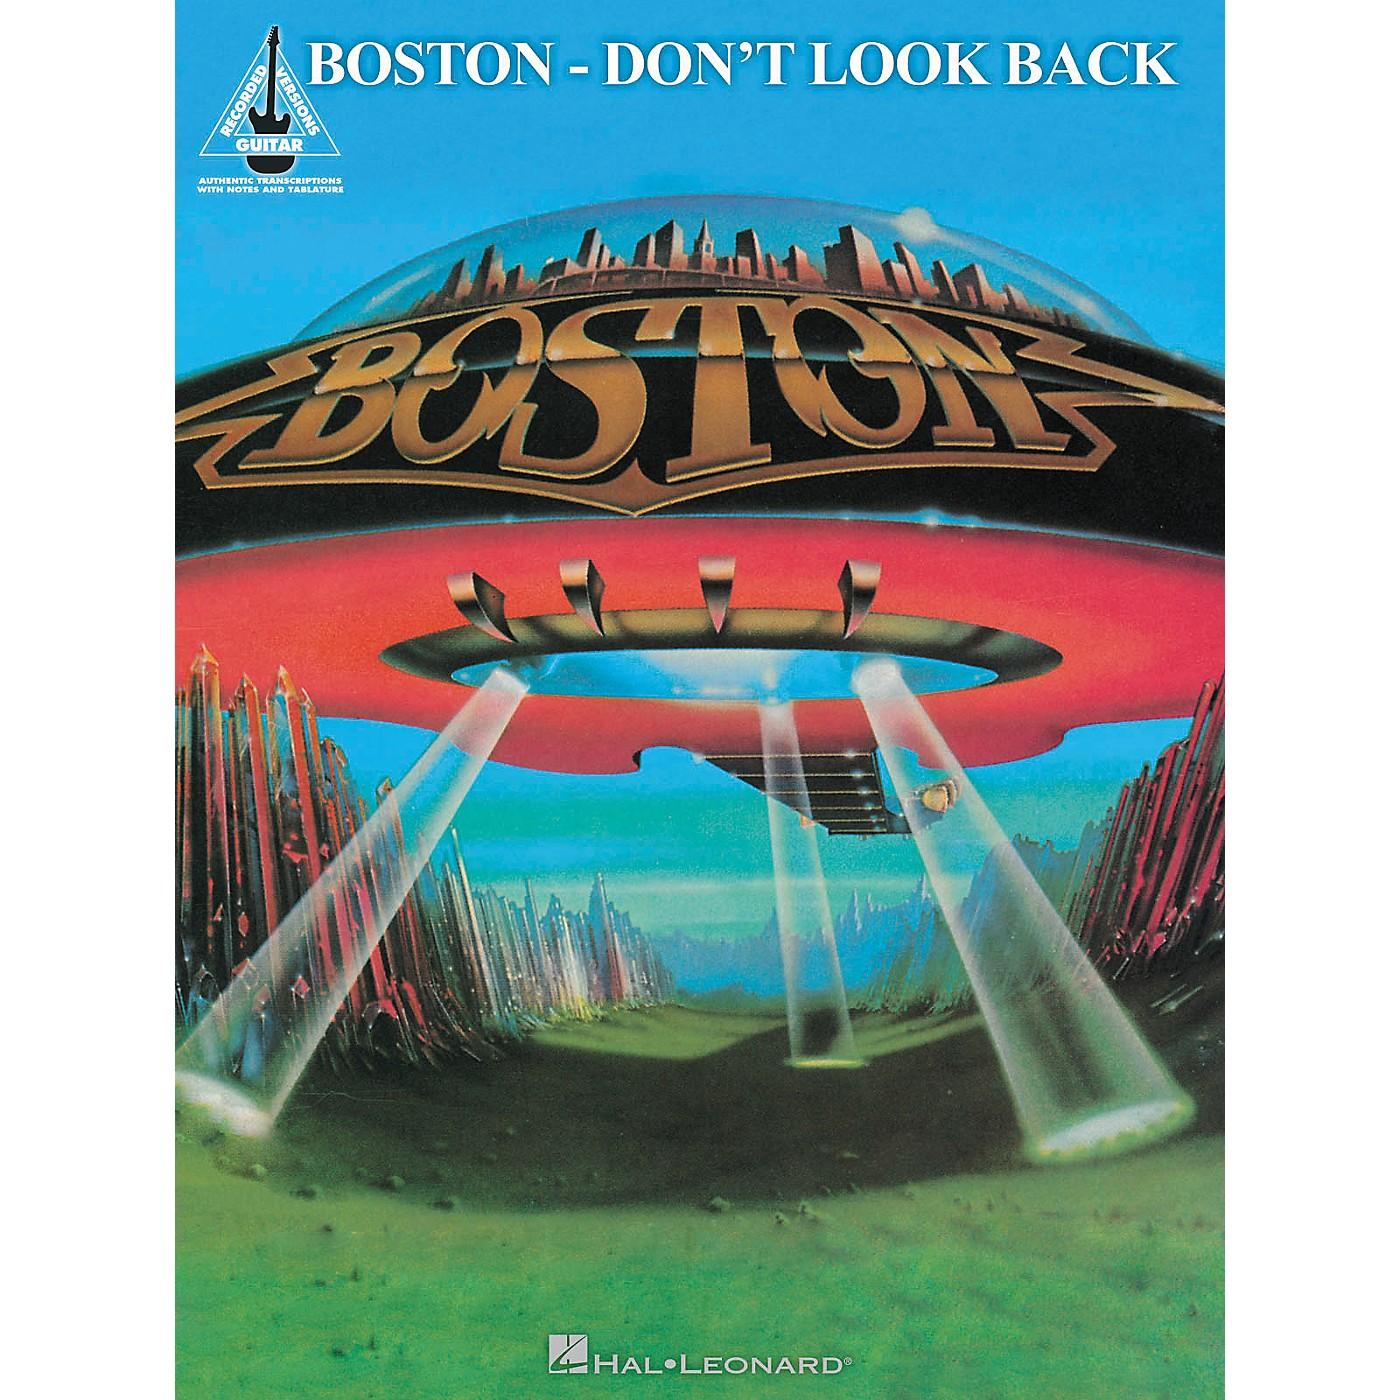 Hal Leonard Boston - Don't Look Back Guitar Recorded Version Songbook thumbnail